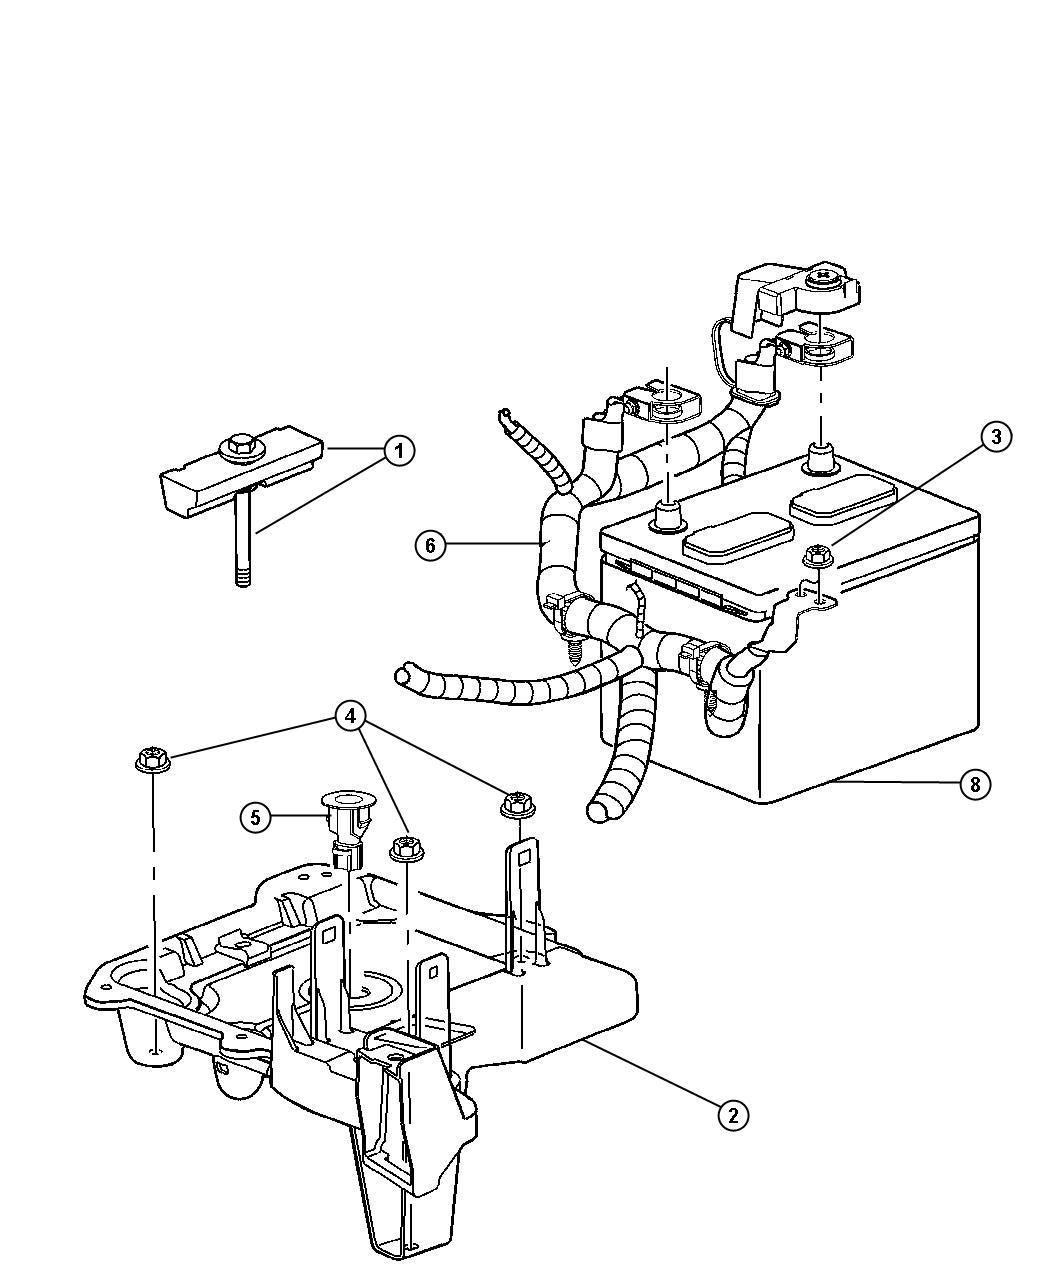 tags: #cj7 ignition wiring#jeep cj7 ignition wiring#1980 jeep cj7 ignition  switch wiring diagram#cj7 engine wiring#1983 jeep cj7 ignition switch#76 cj7